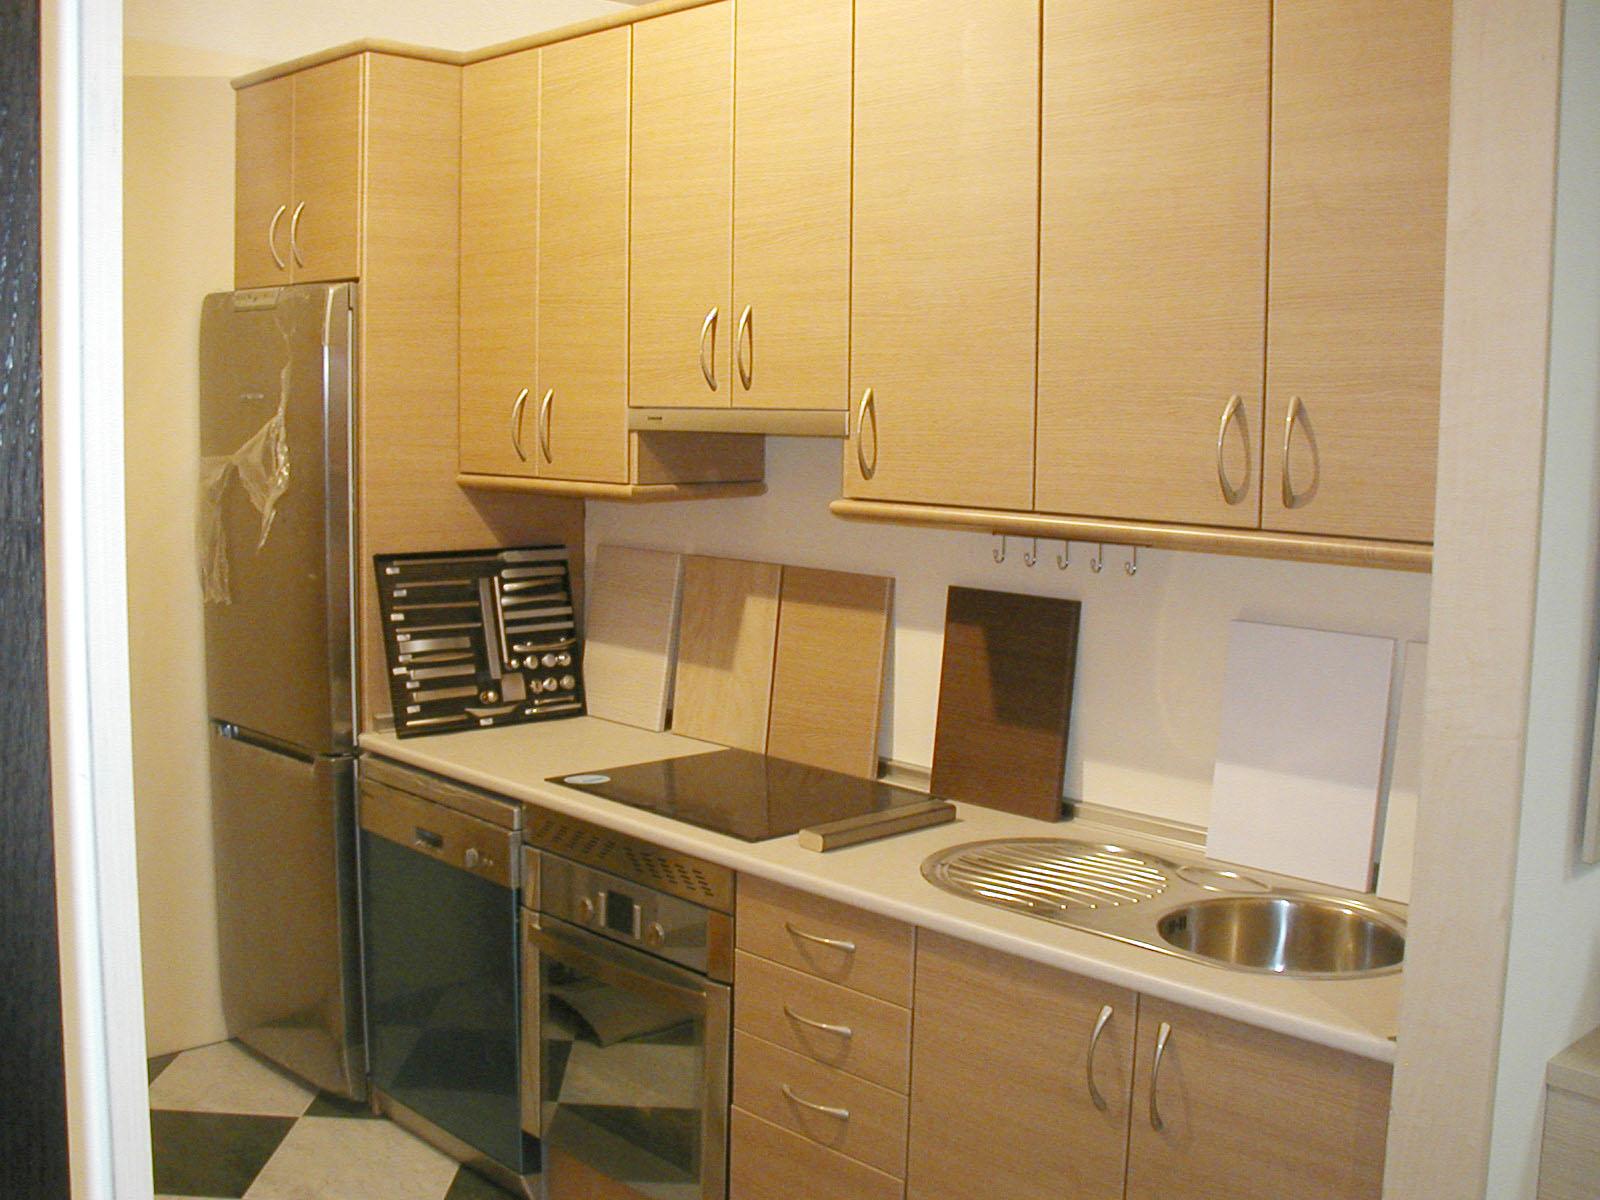 Todomadera cocinas de su exposici n en murcia todas han - Ver cocinas montadas ...